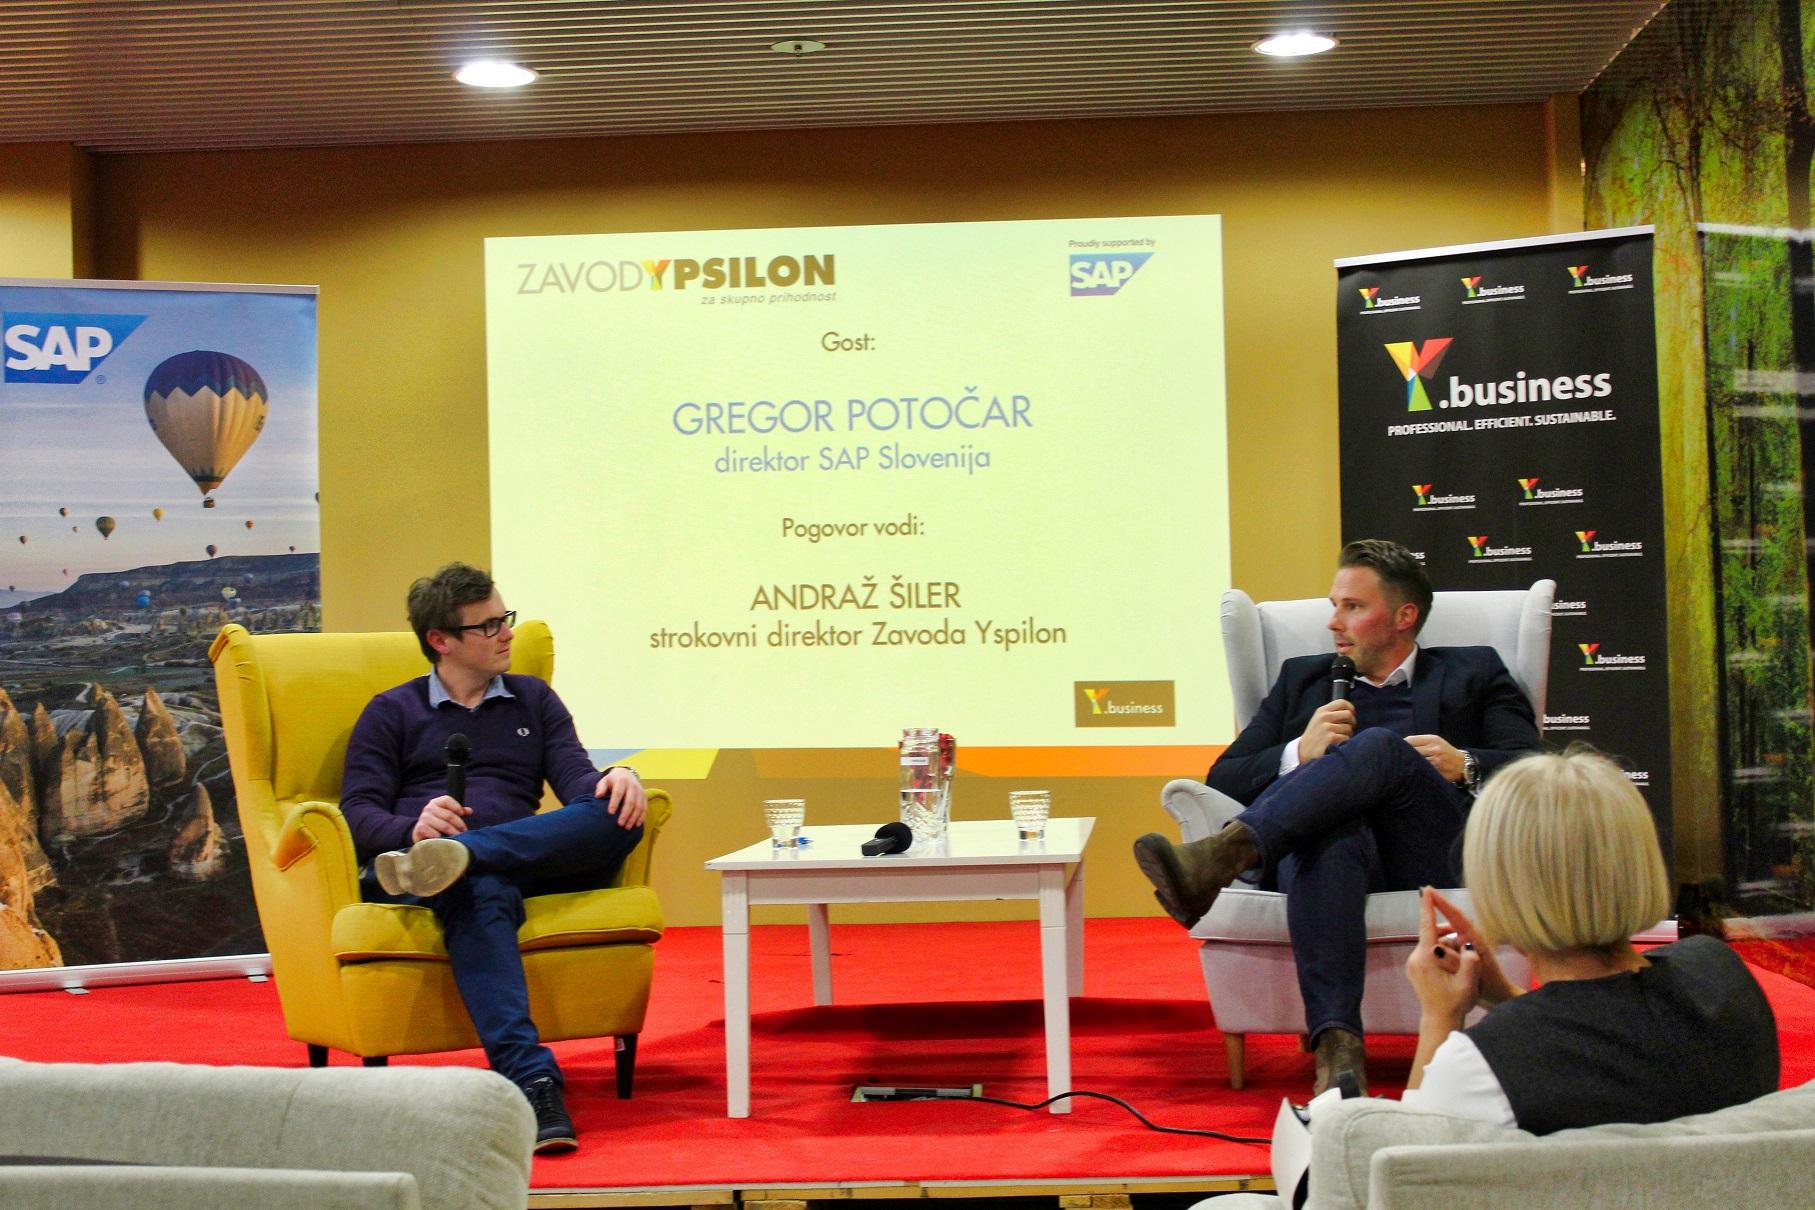 Success Story Gregor Potočar ABC Hub Zavod Ypsilon 3 small